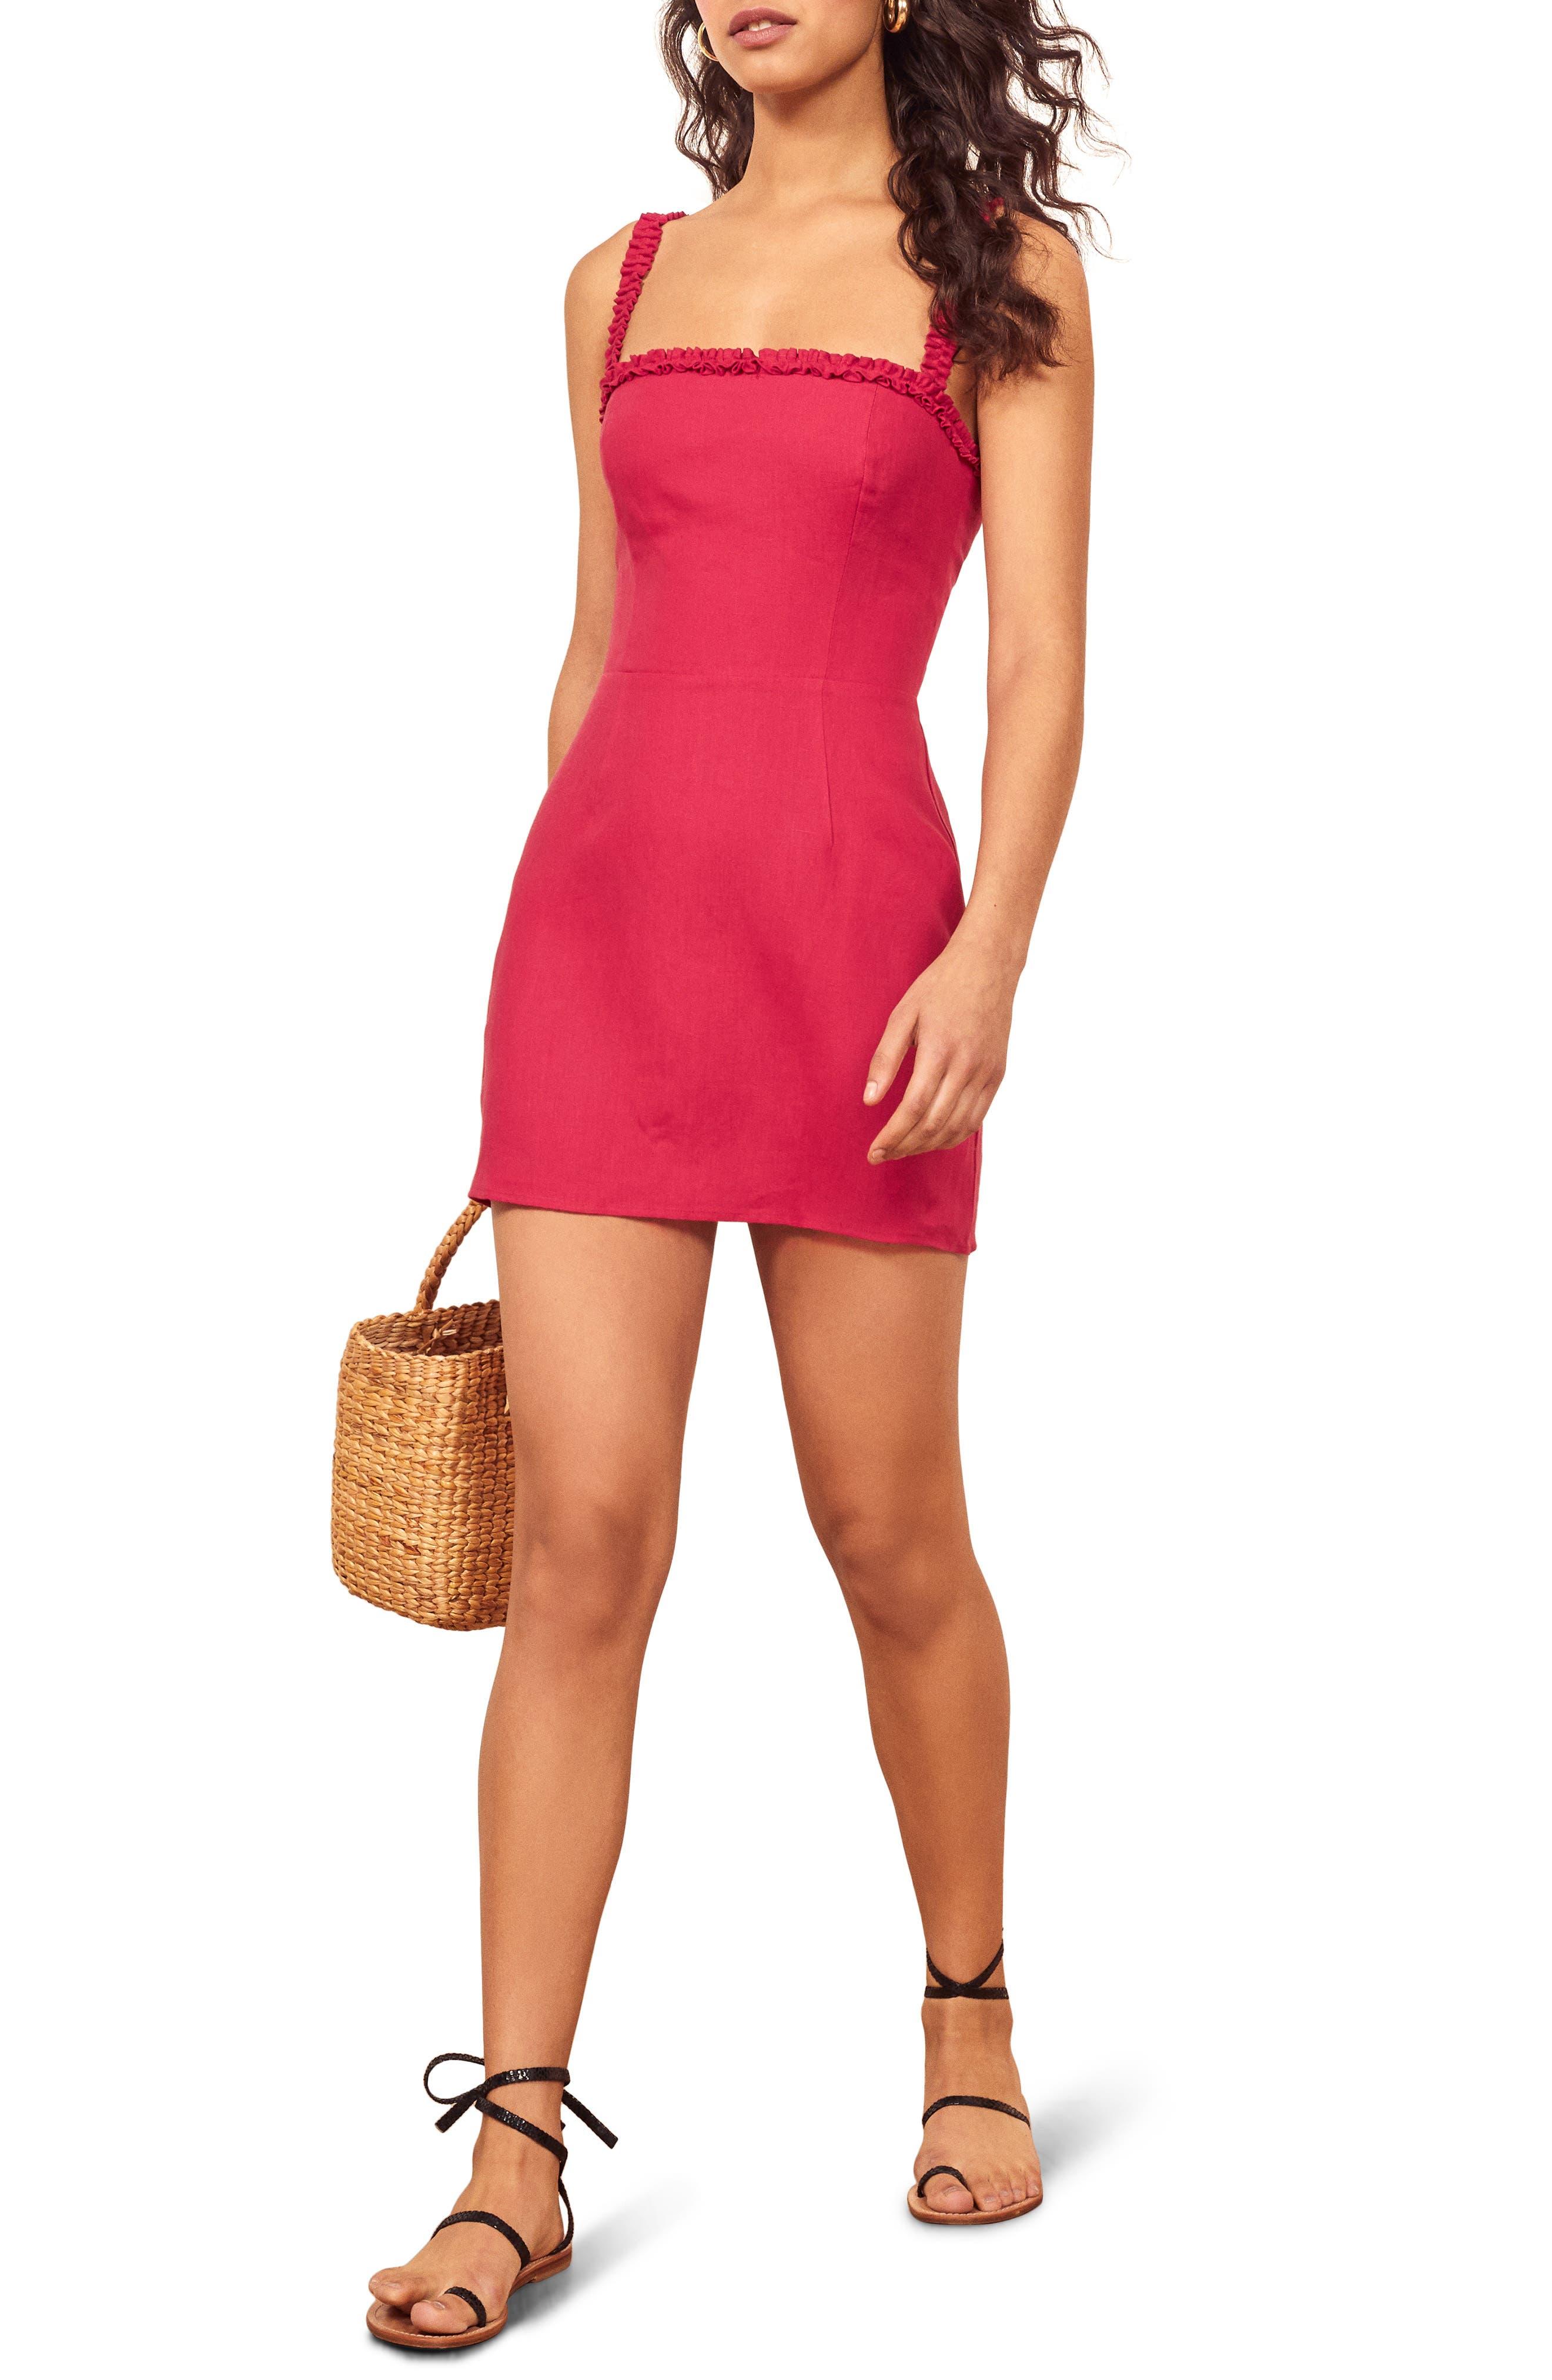 Reformation Janie Minidress, Pink